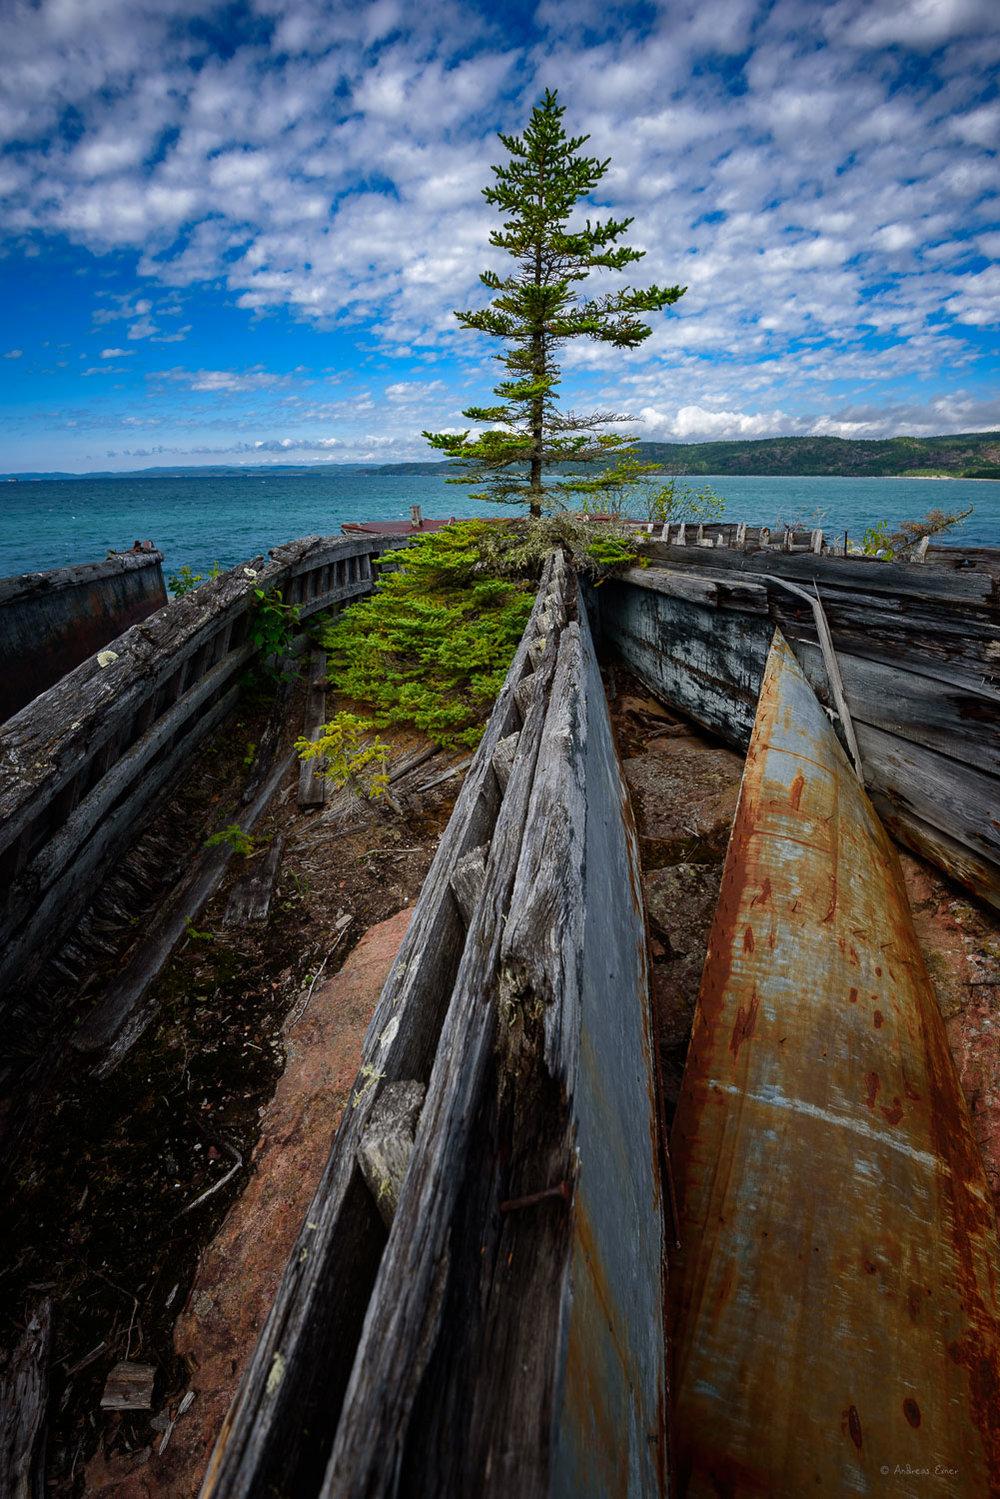 Lake Superior, Neys Provincial Park, Ontario, Canada ------------